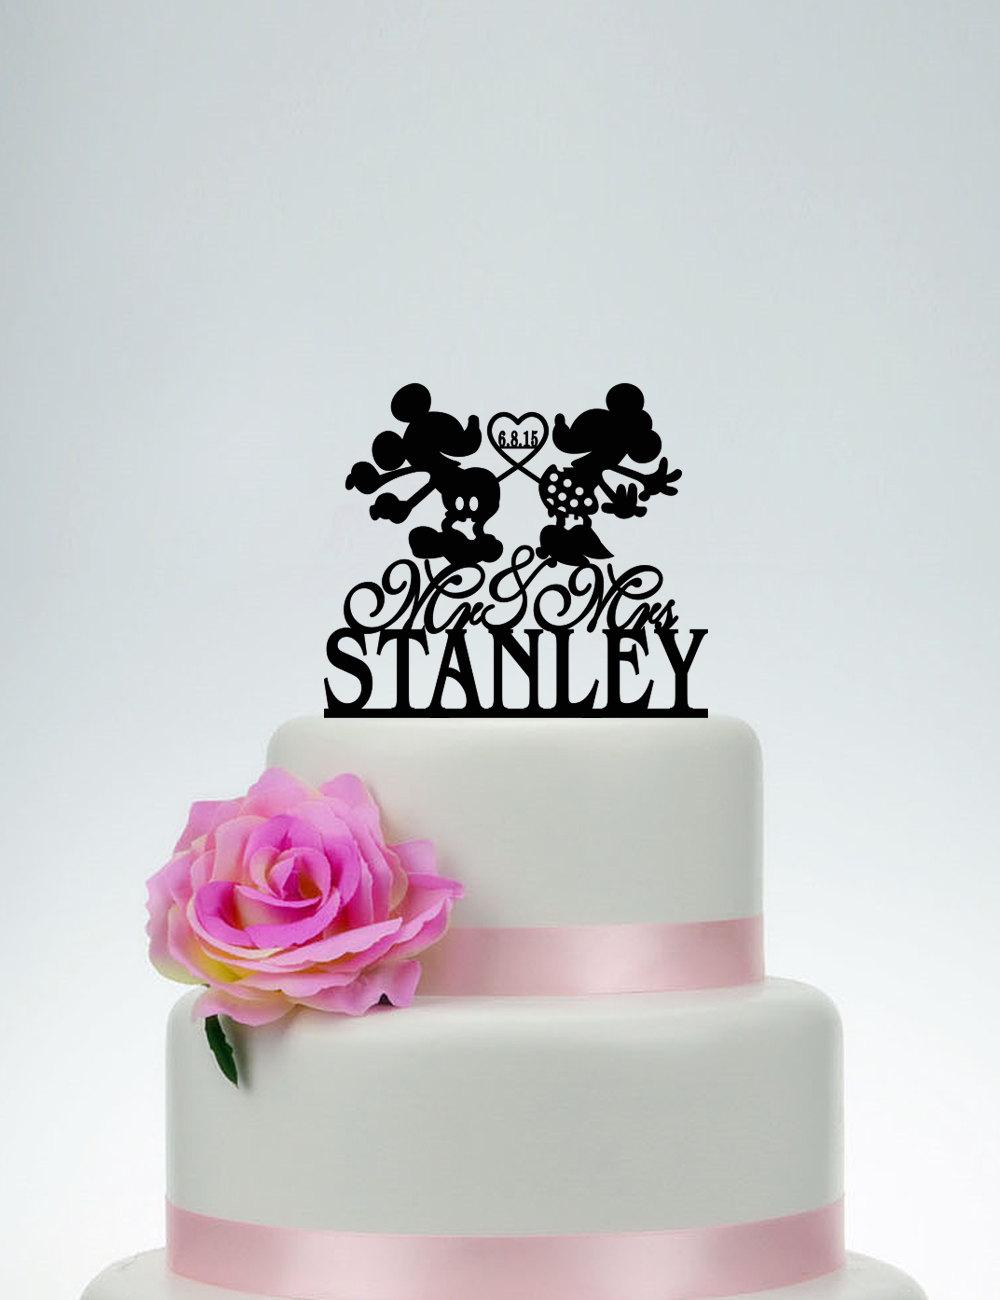 Custom Cake Topper, Wedding Topper, Personalized Topper, Mickey & Minnie Topper, Bride Groom Topper, Disney Topper C066